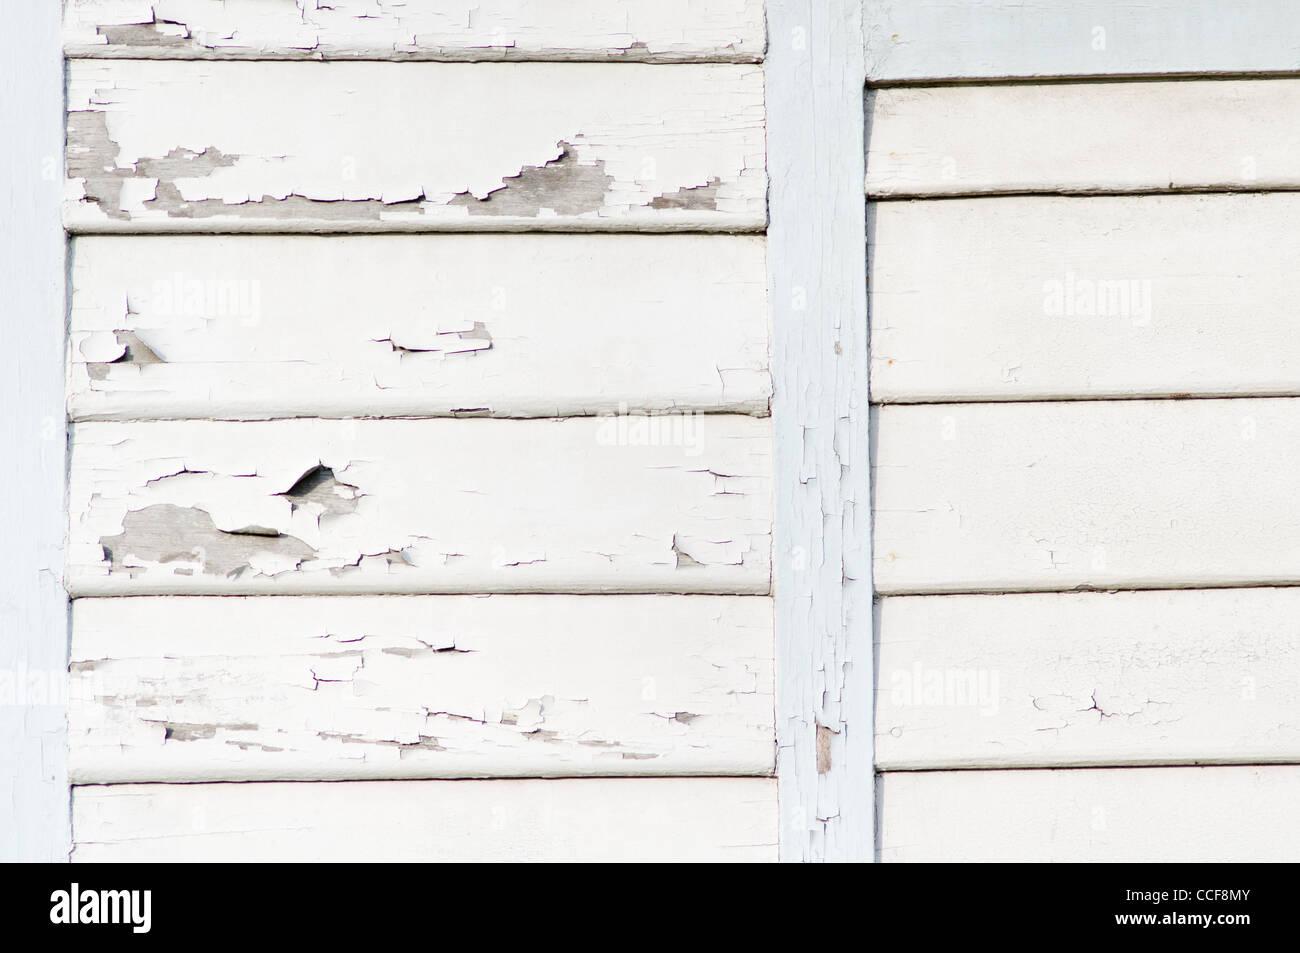 Pared de madera con peeling pintura blanca. Imagen De Stock